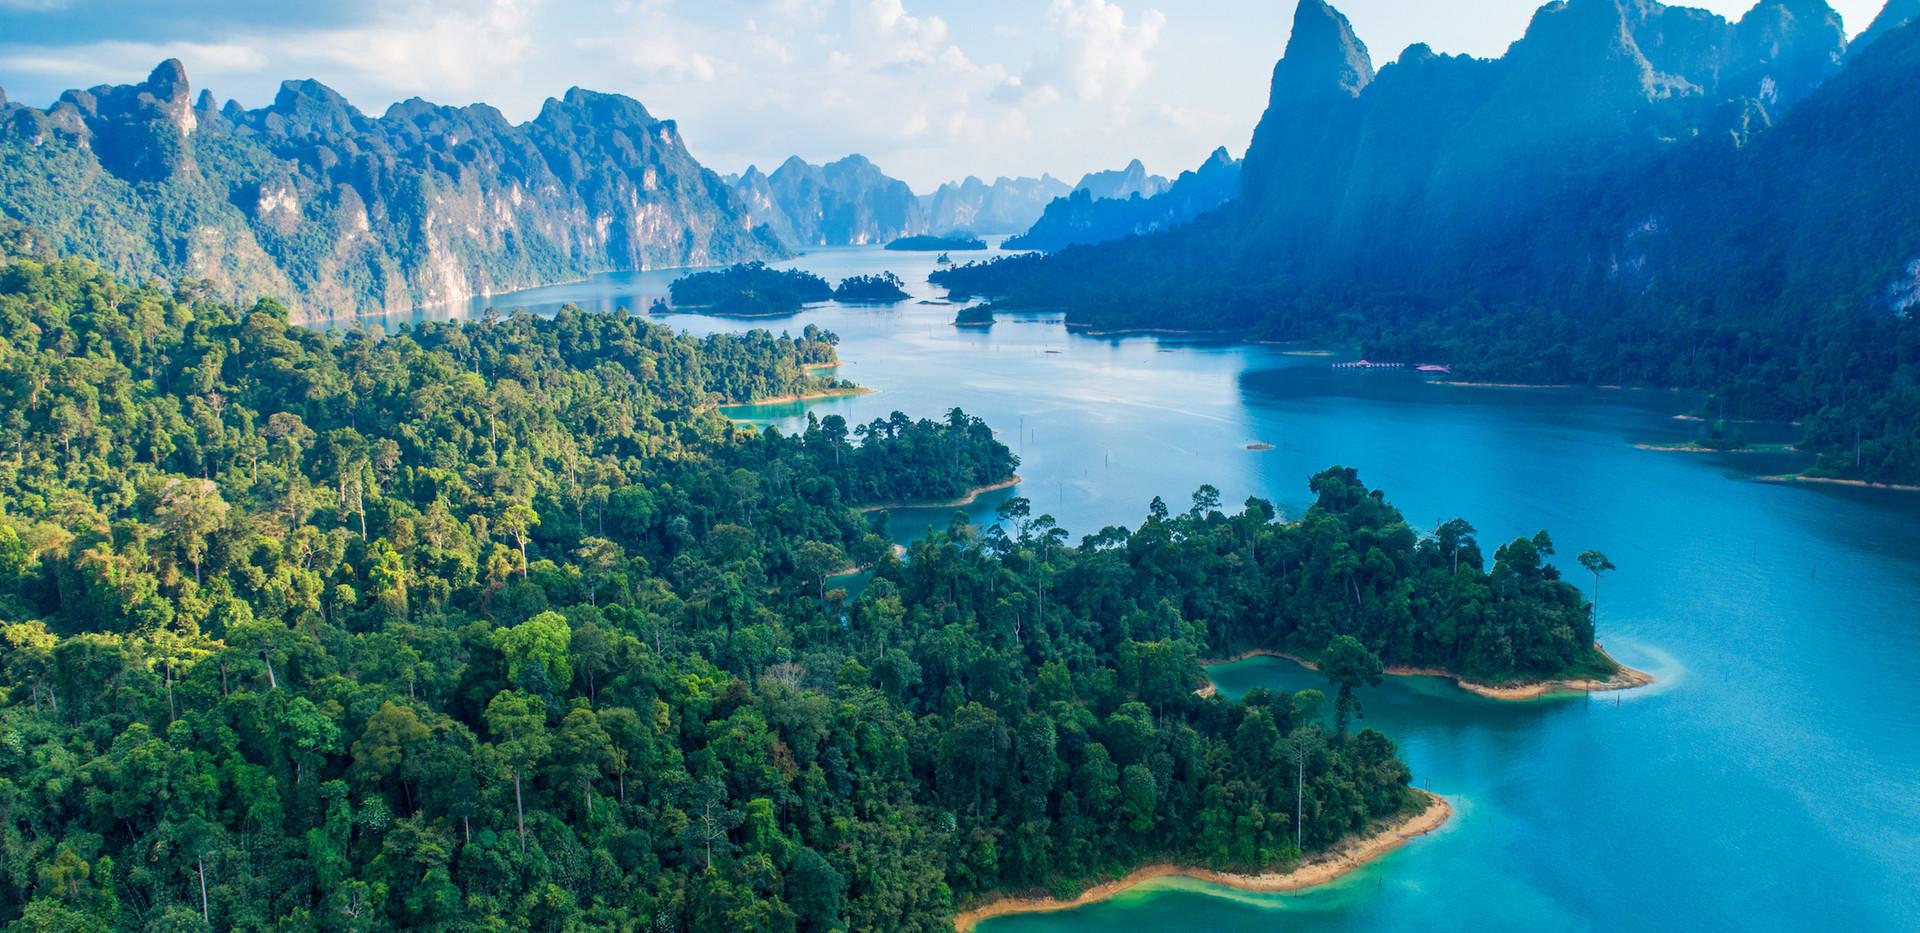 Thailand Yoga Holidays Destination Jungle Treehouse Topview